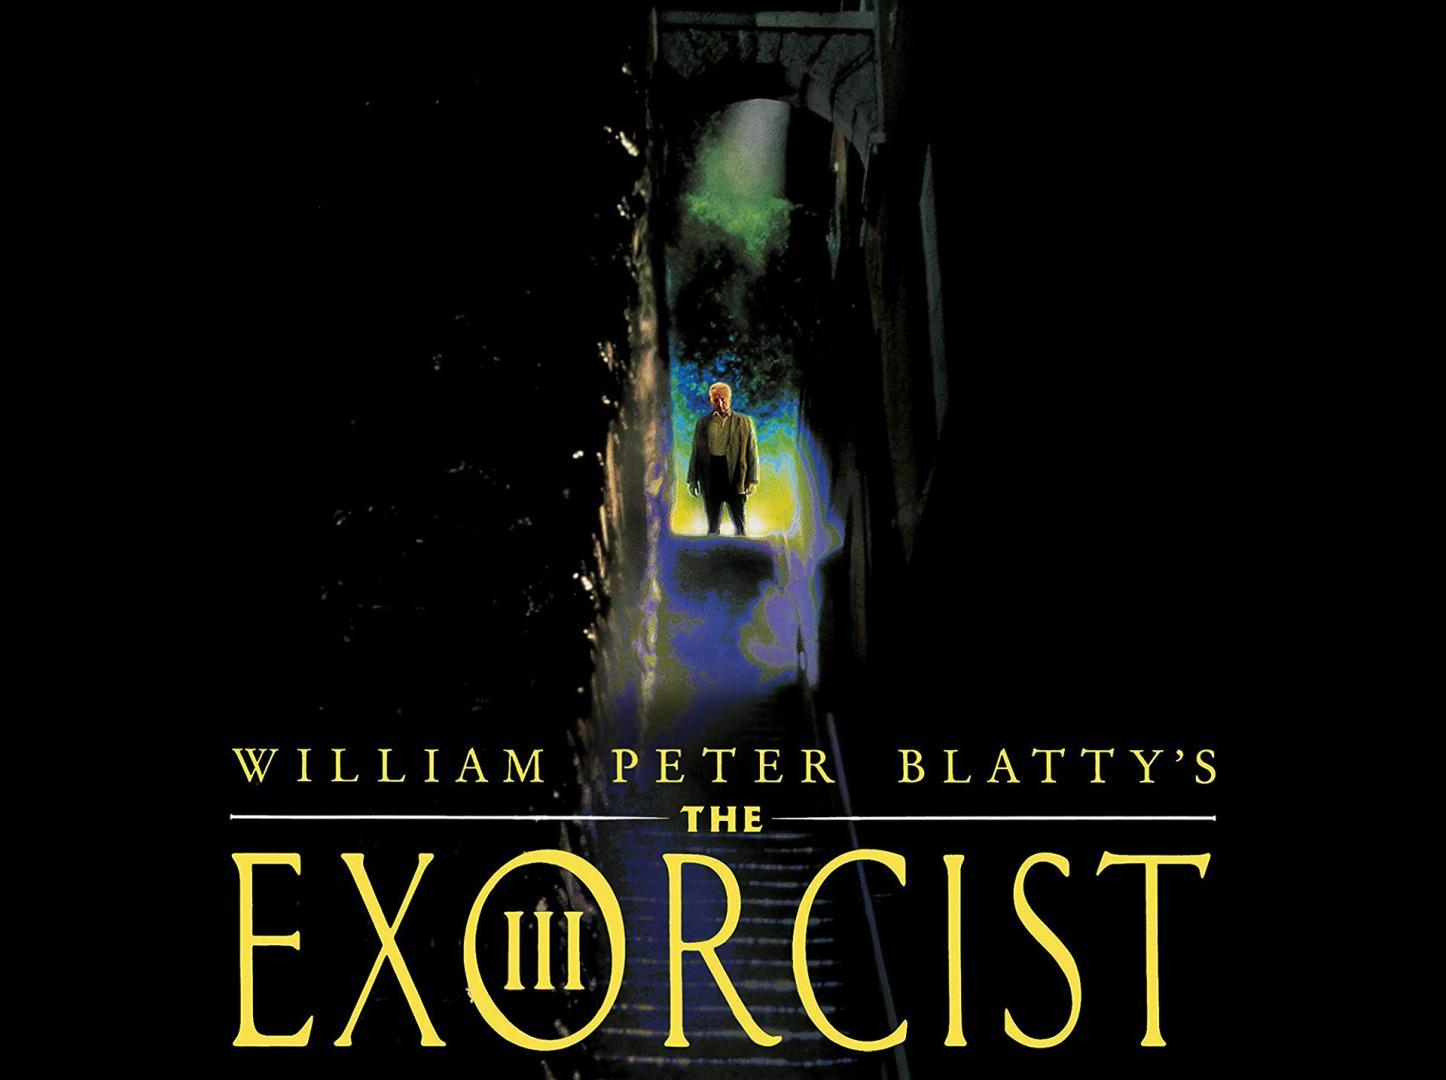 The Exorcist III / Ördögűző 3. (1990)